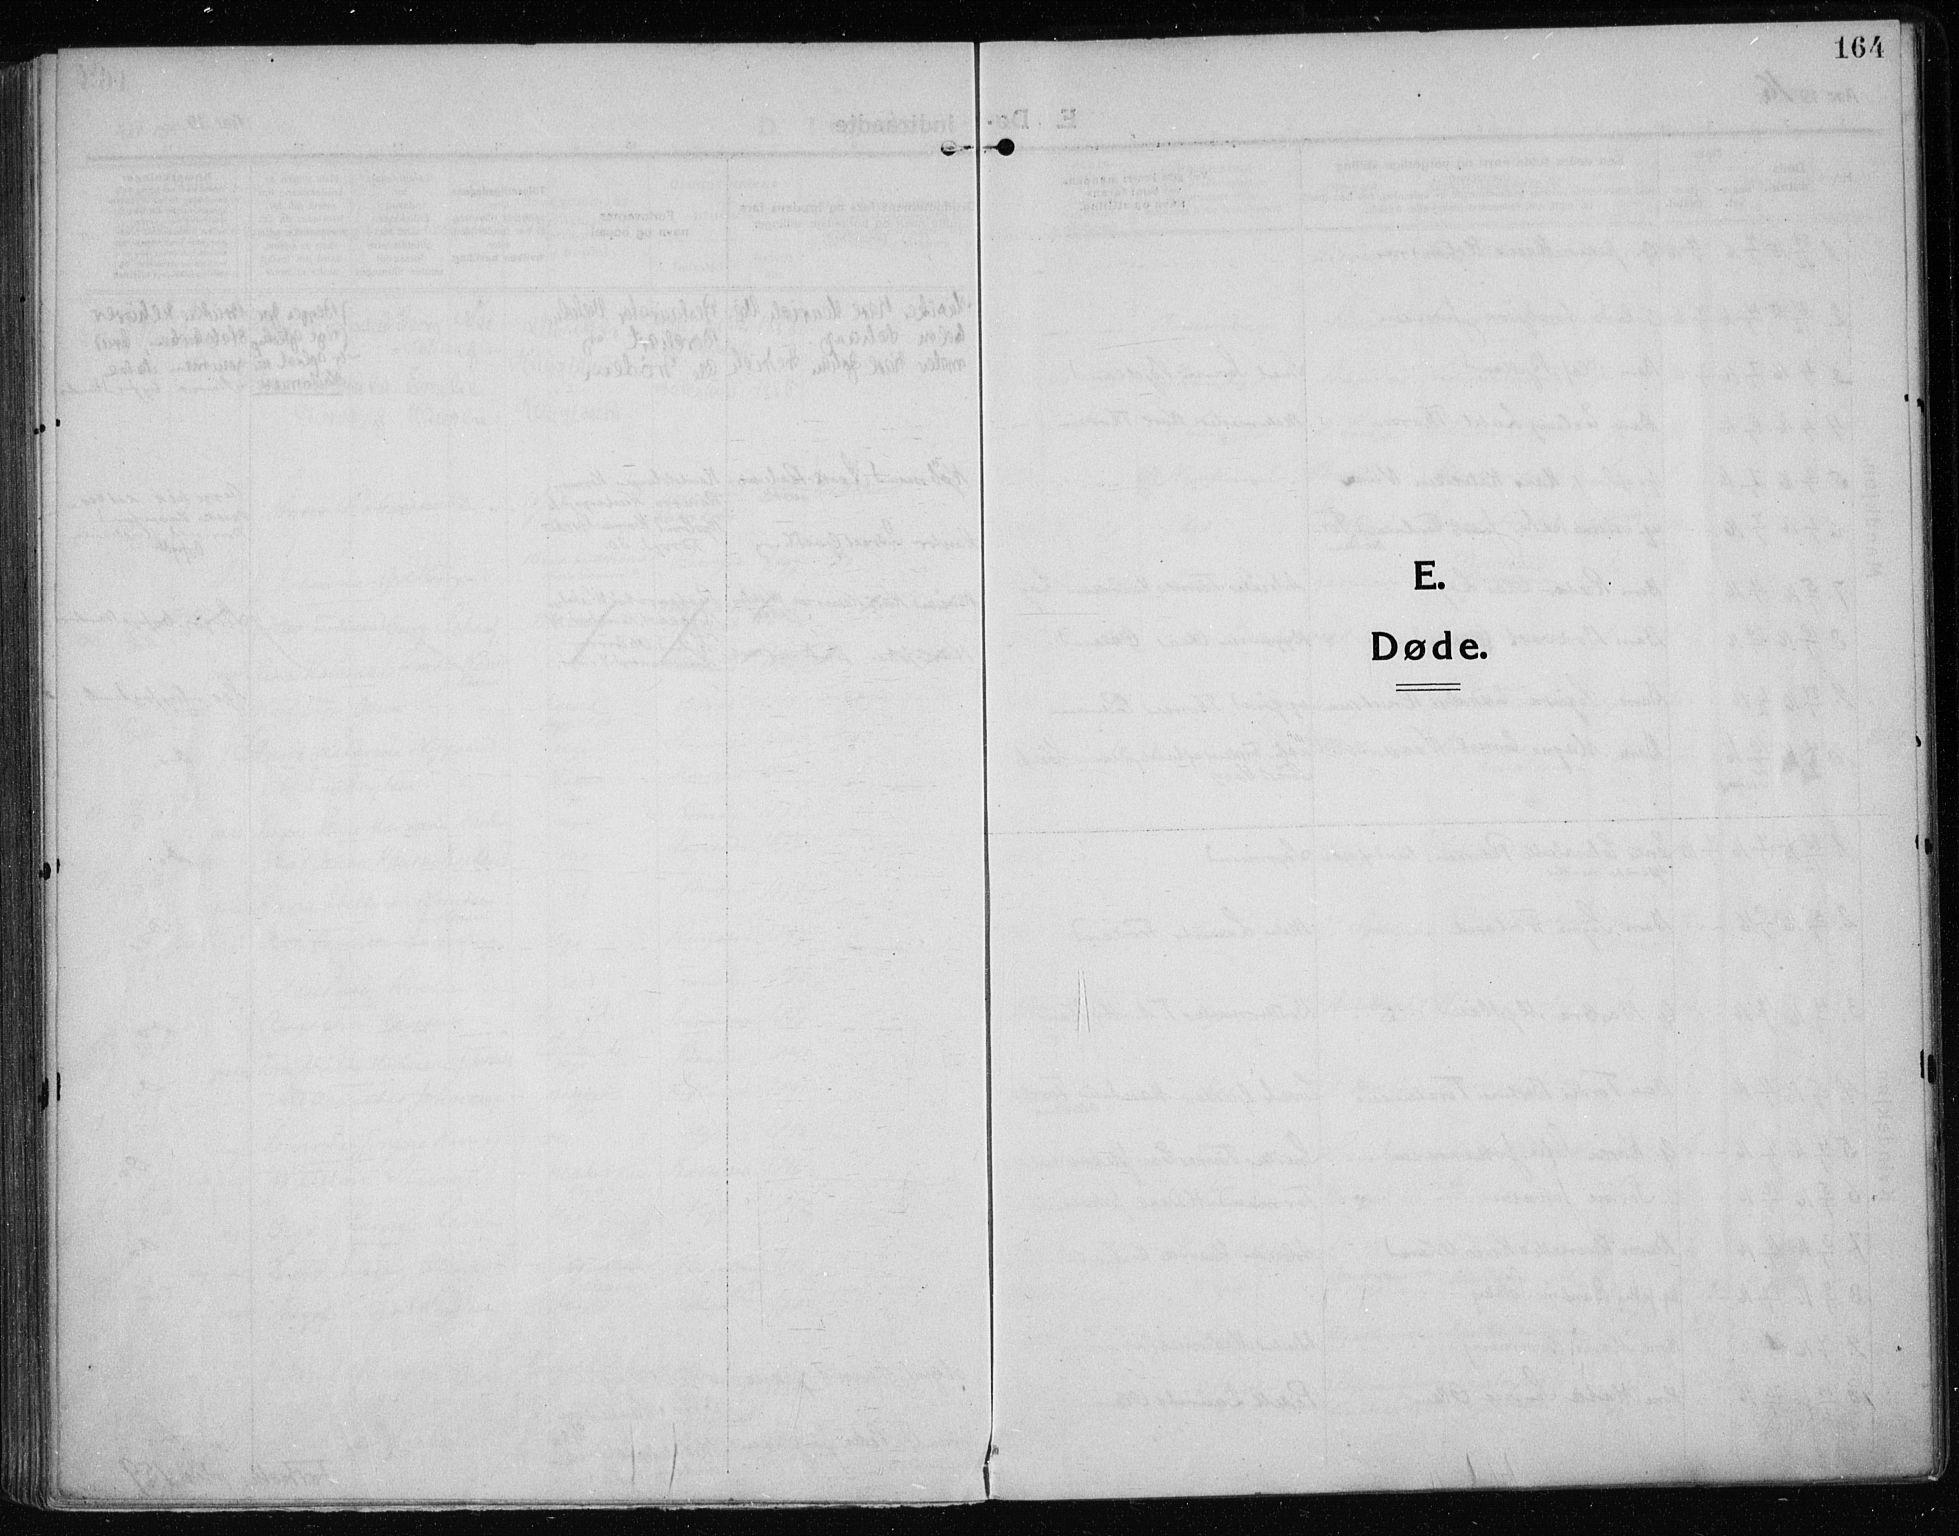 SAST, Haugesund sokneprestkontor, H/Ha/Haa/L0009: Ministerialbok nr. A 9, 1914-1929, s. 164